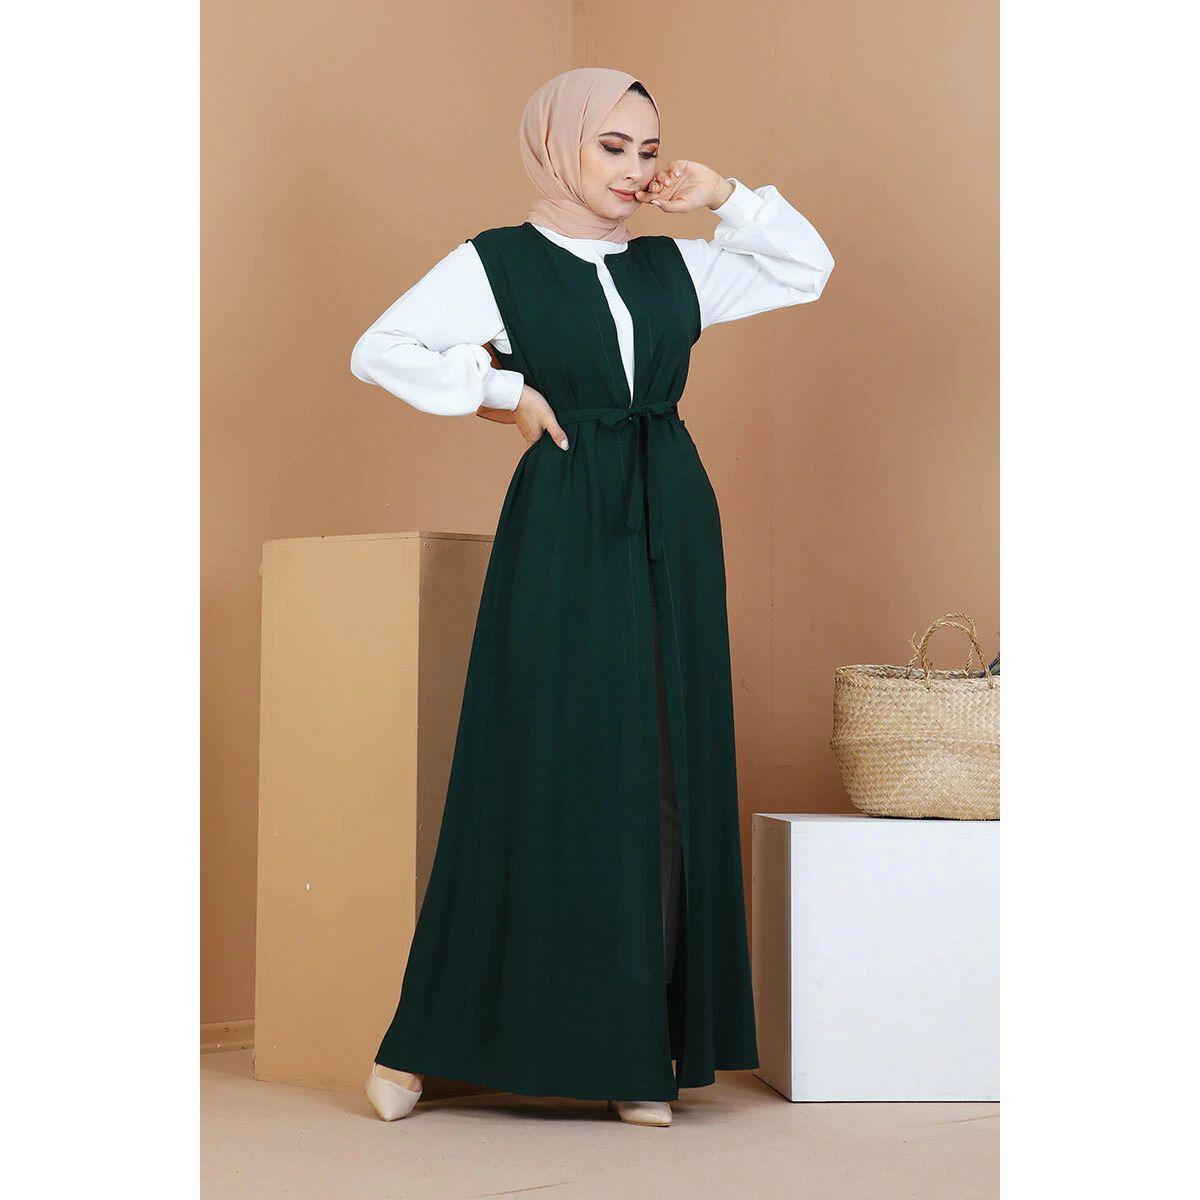 Belt detailed Vest Haki,Muslim fashion, Vest for Muslim woman,2021 Woman foshion,Young muslim woman fashion,Women vest.